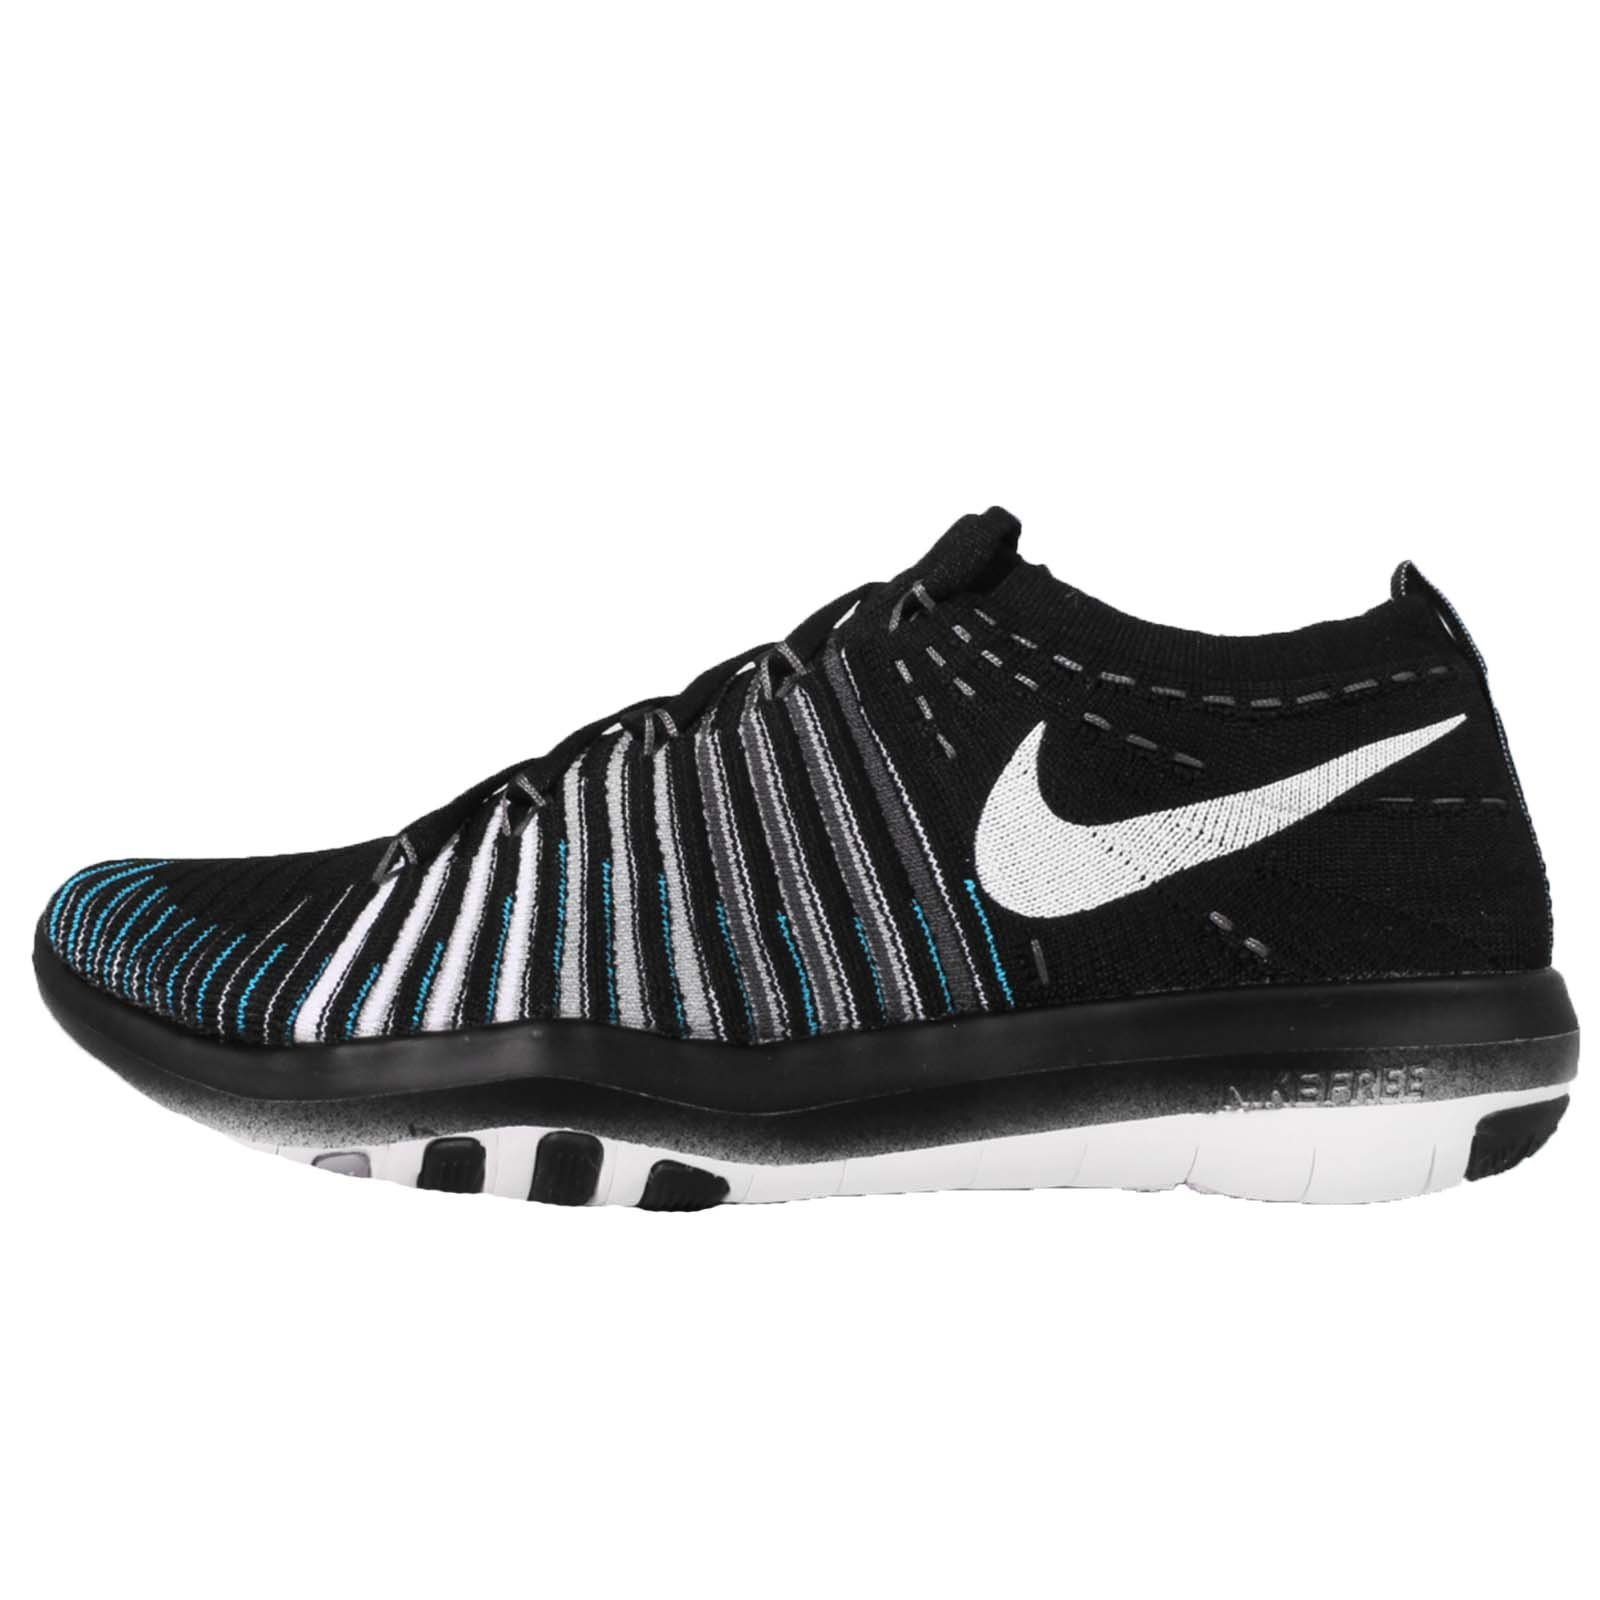 Nike Women's Free Transform Flyknit Training Shoe, BLACK/WHITE-WOLF GREY-DARK GREY, 10 B(M) US